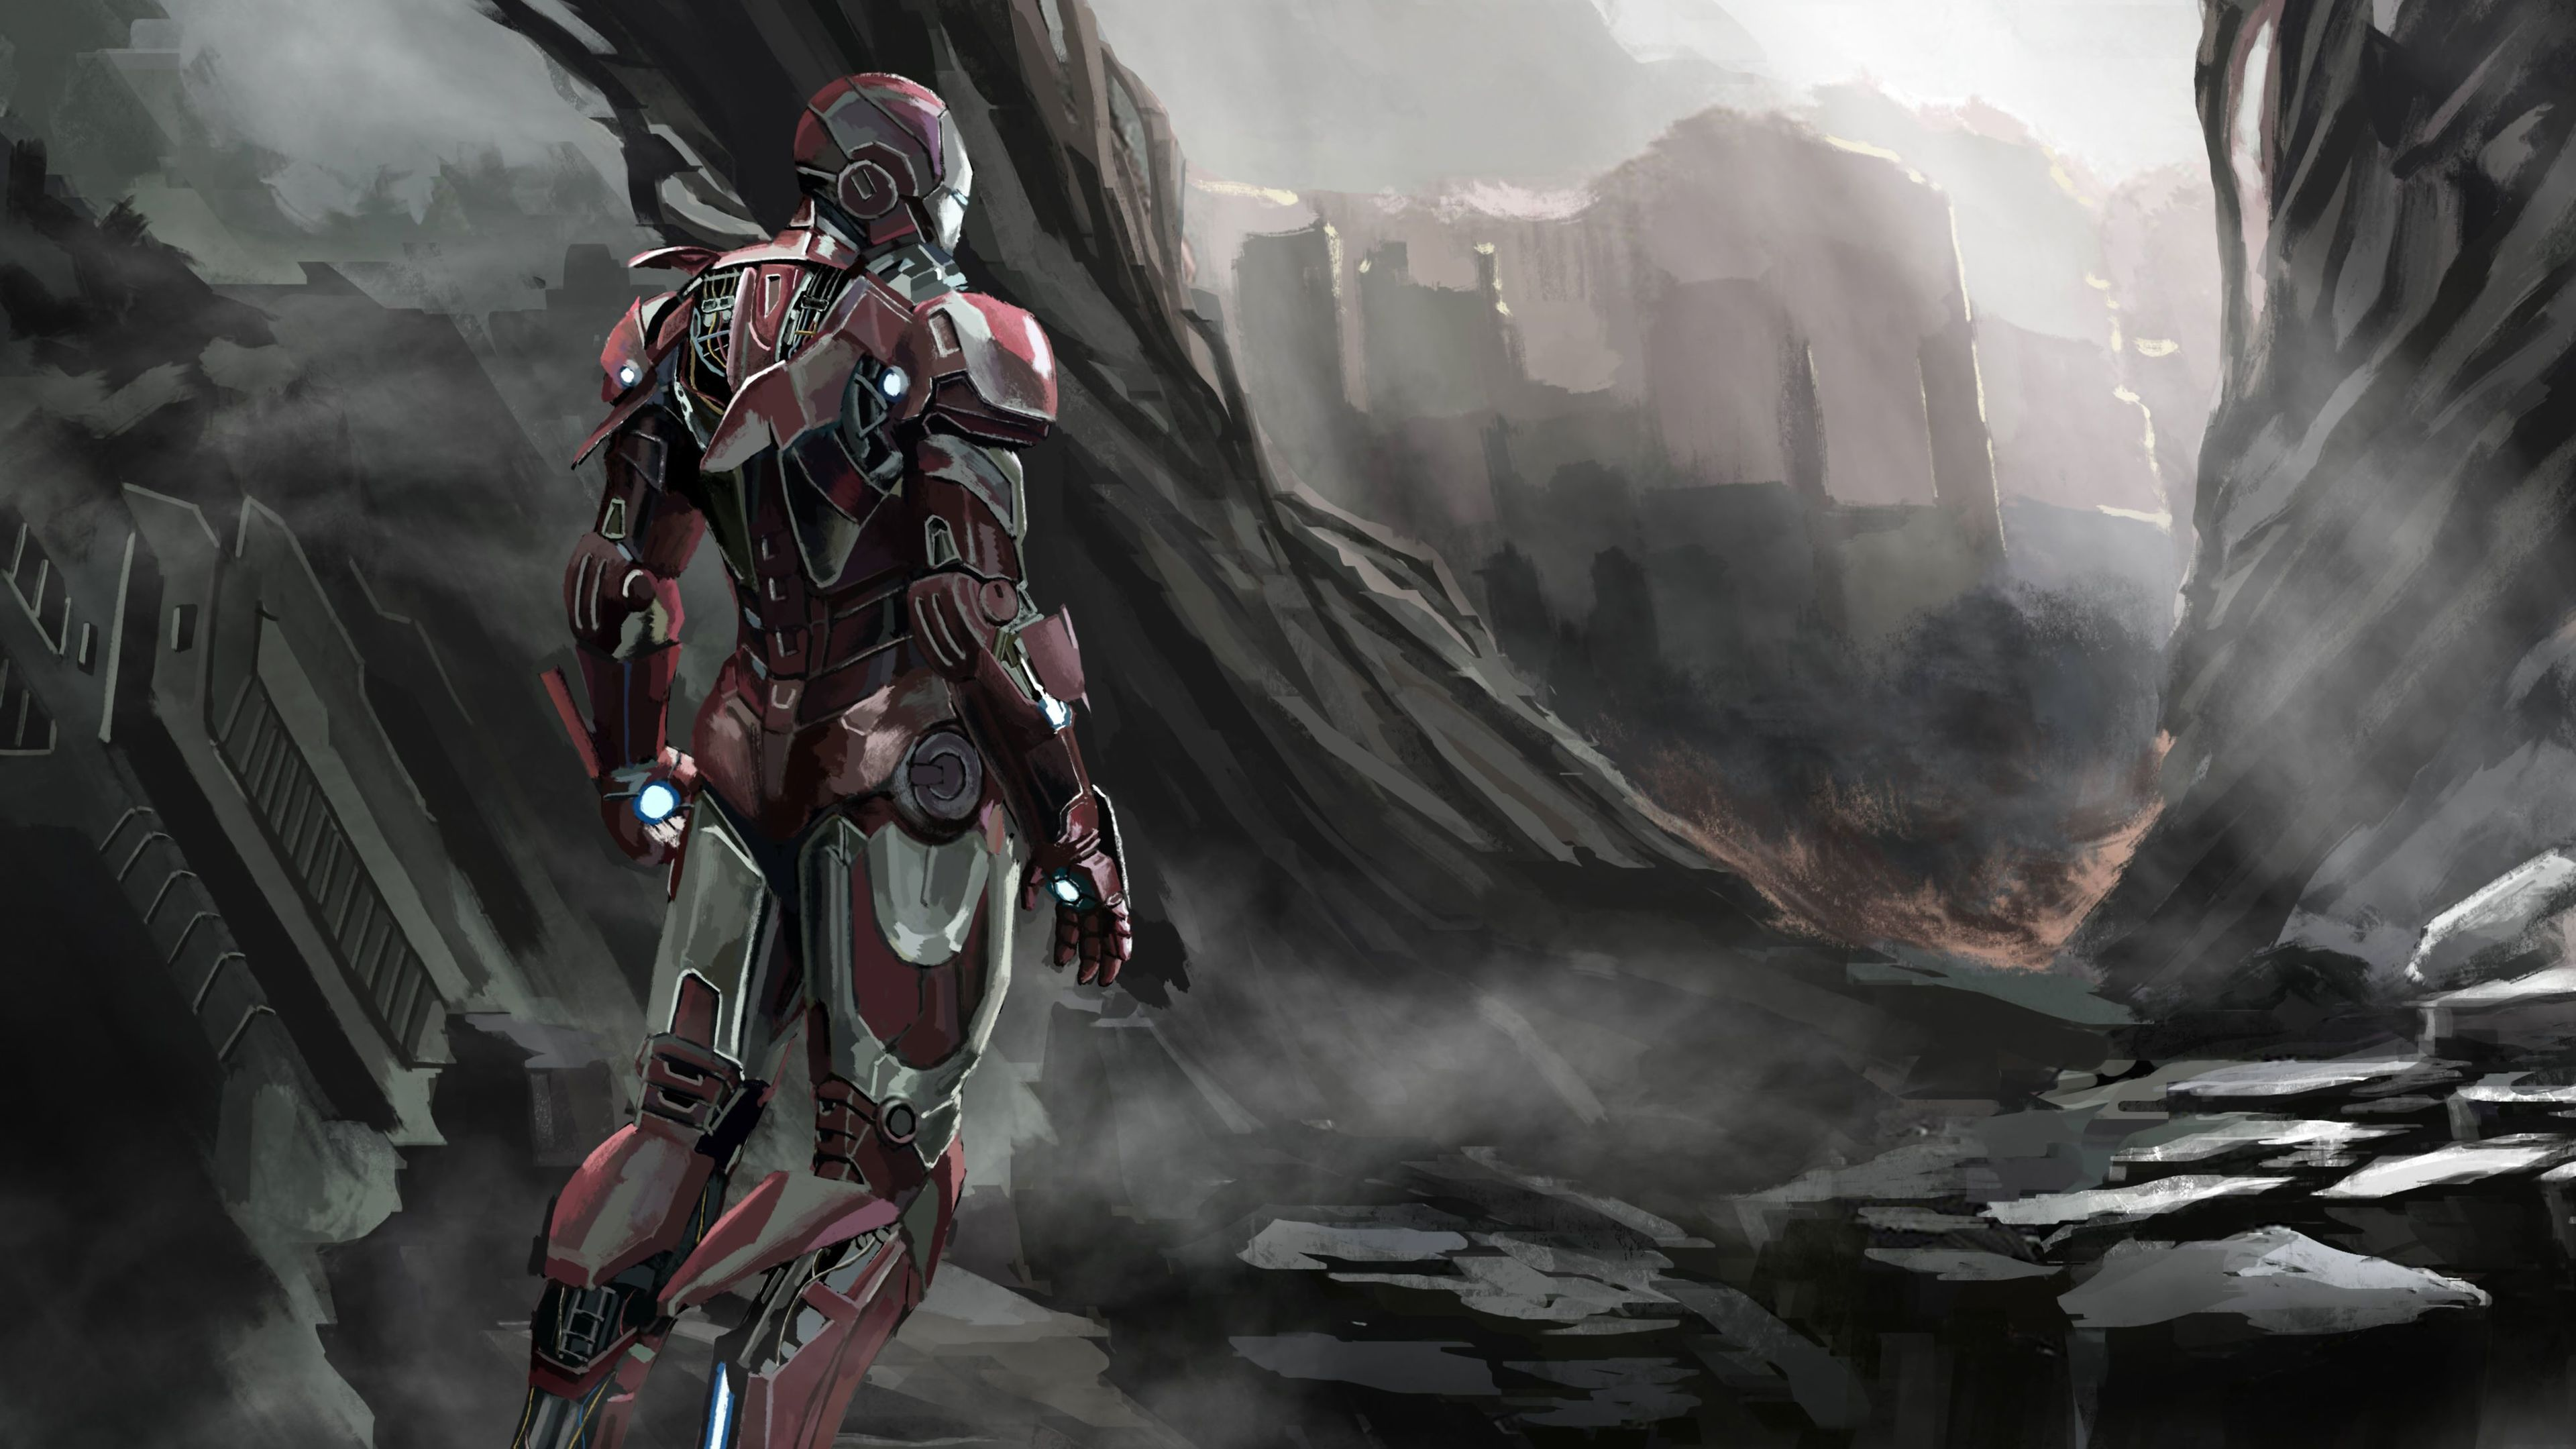 Wallpaper 4k Iron Man Art 2019 4k 4k Wallpapers Artwork